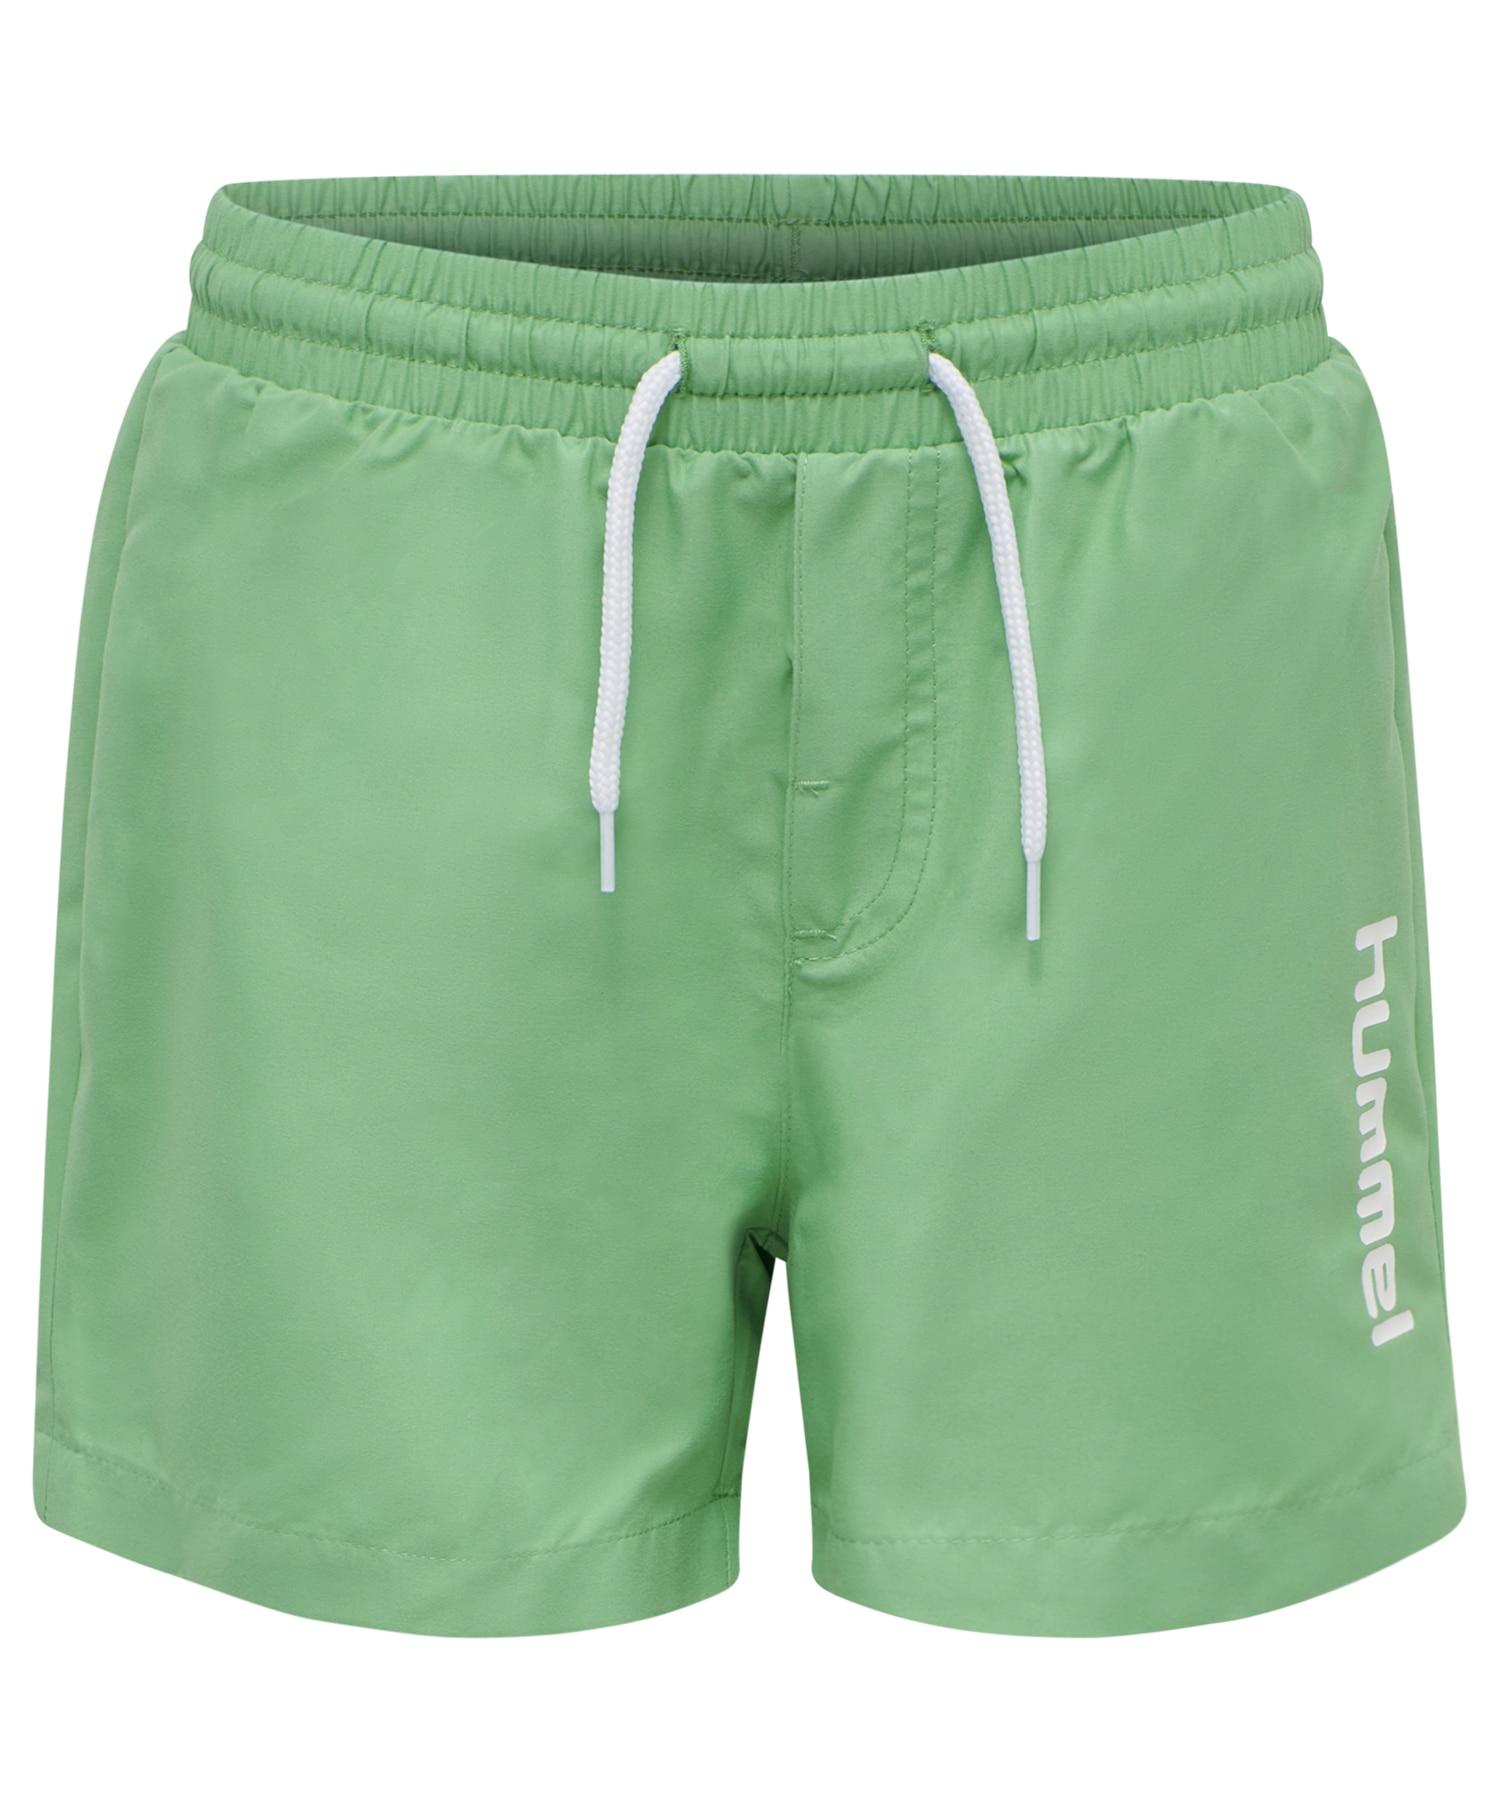 Hummel Bondi Boardshorts